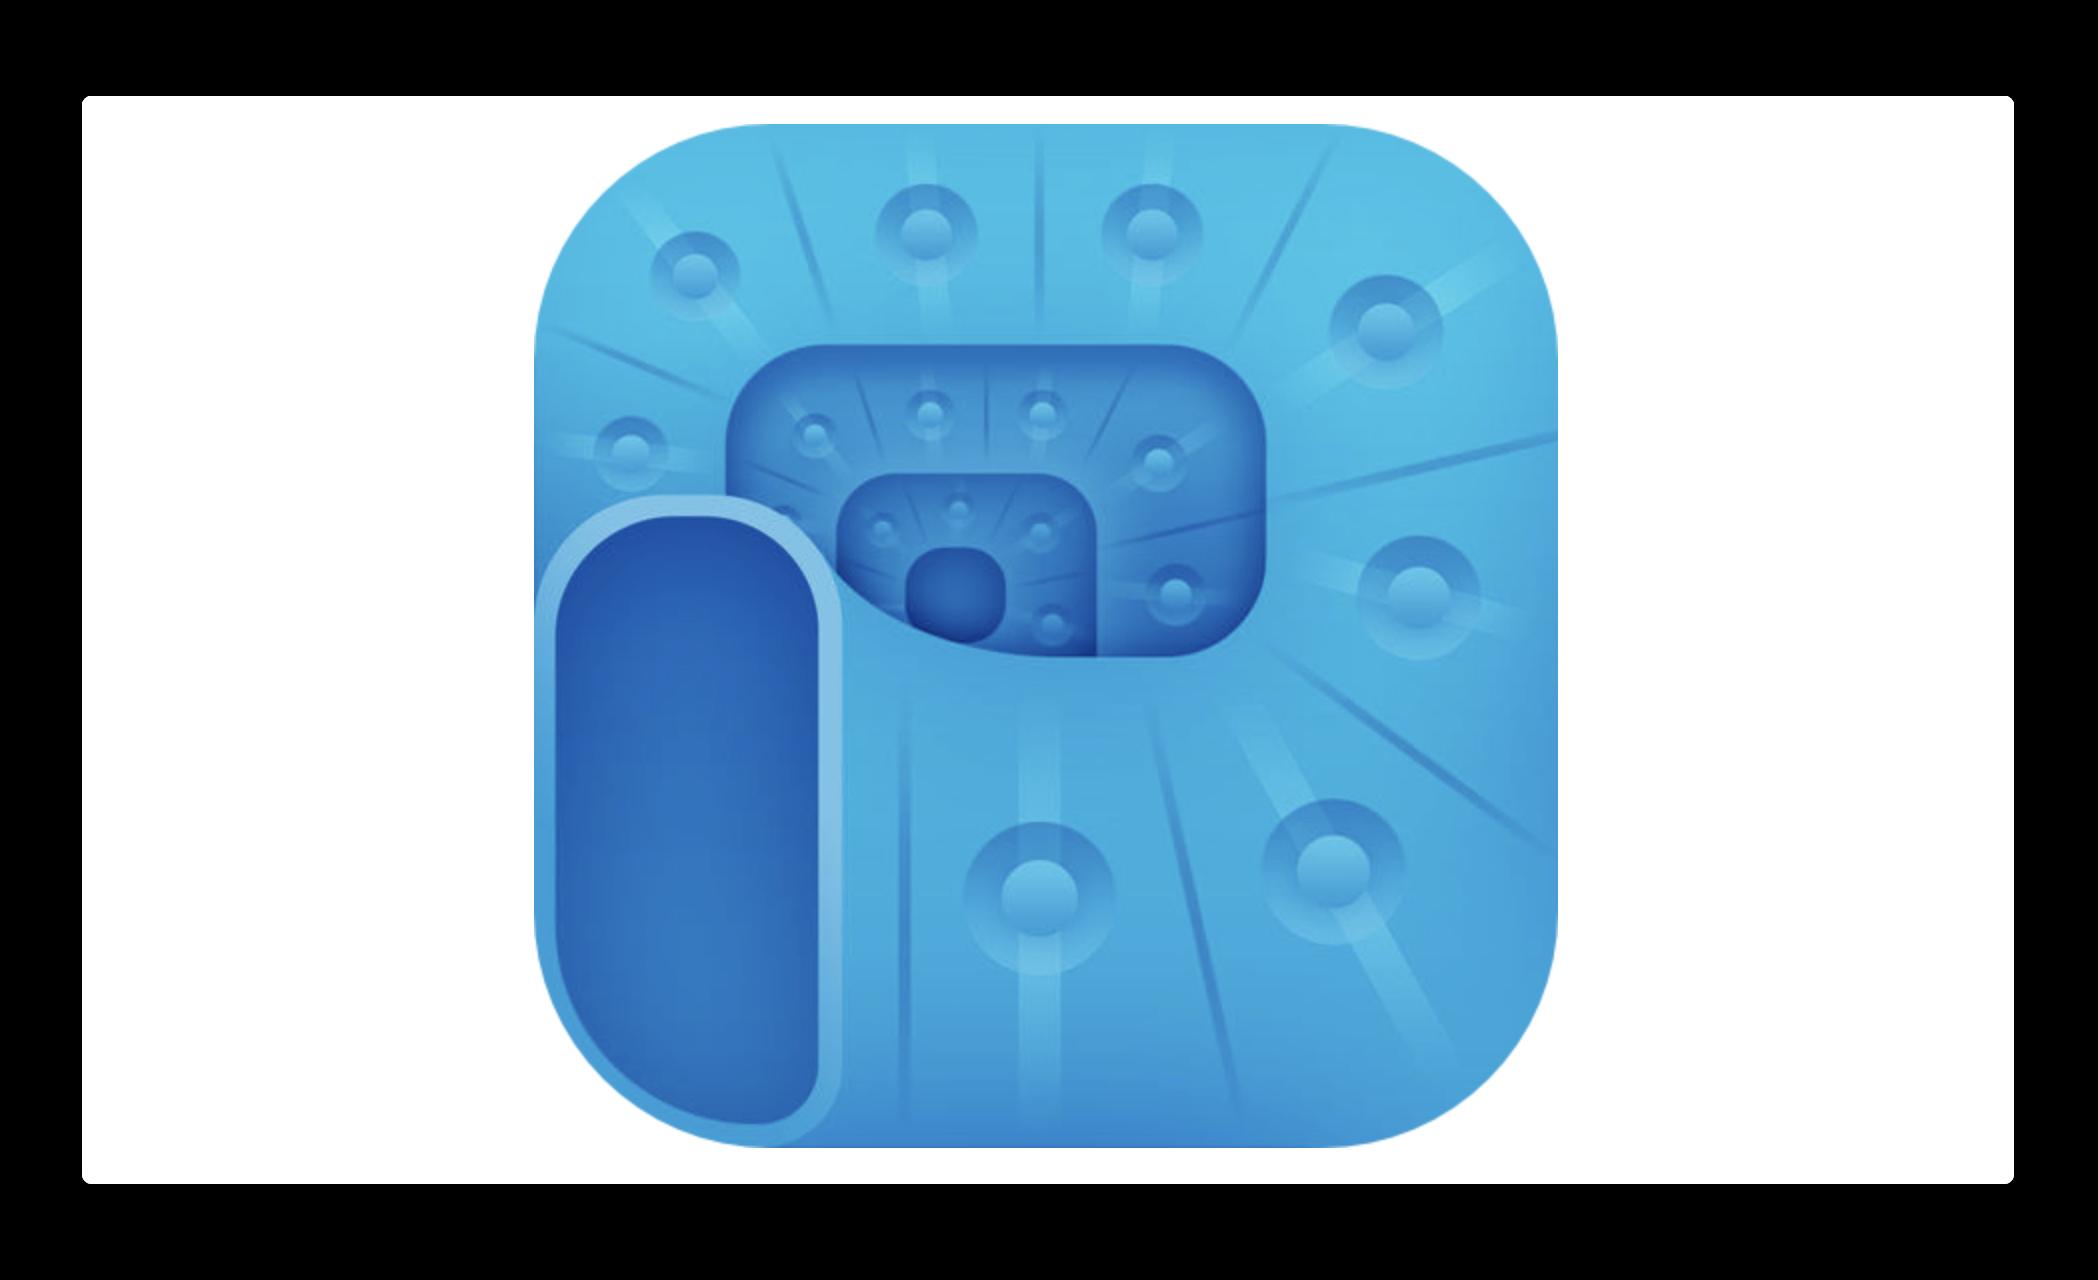 Apple、iCloudストレージ無償のユーザーに、1カ月間の無料試用を提供